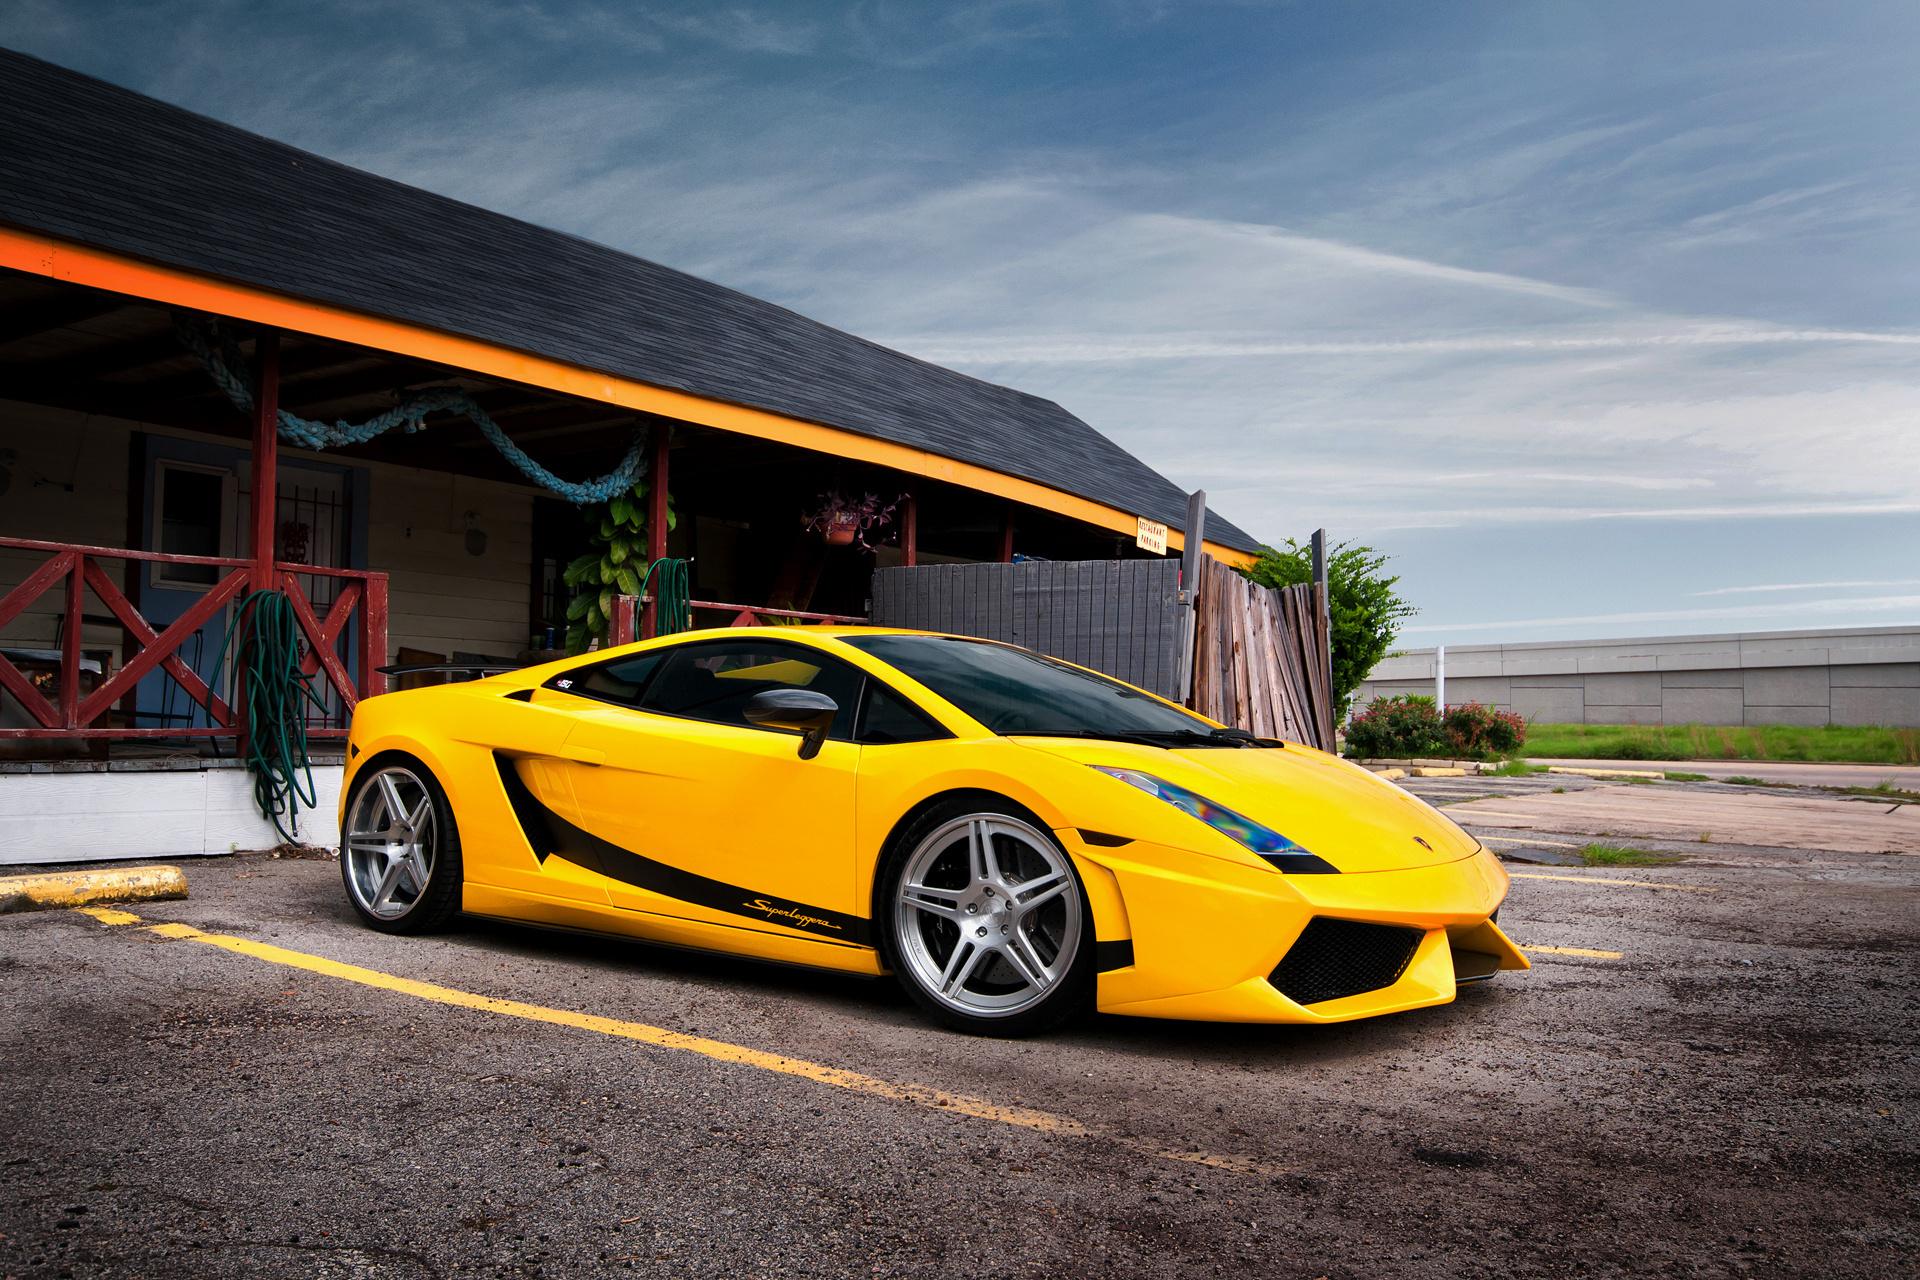 How To Sell My Lamborghini Gallardo